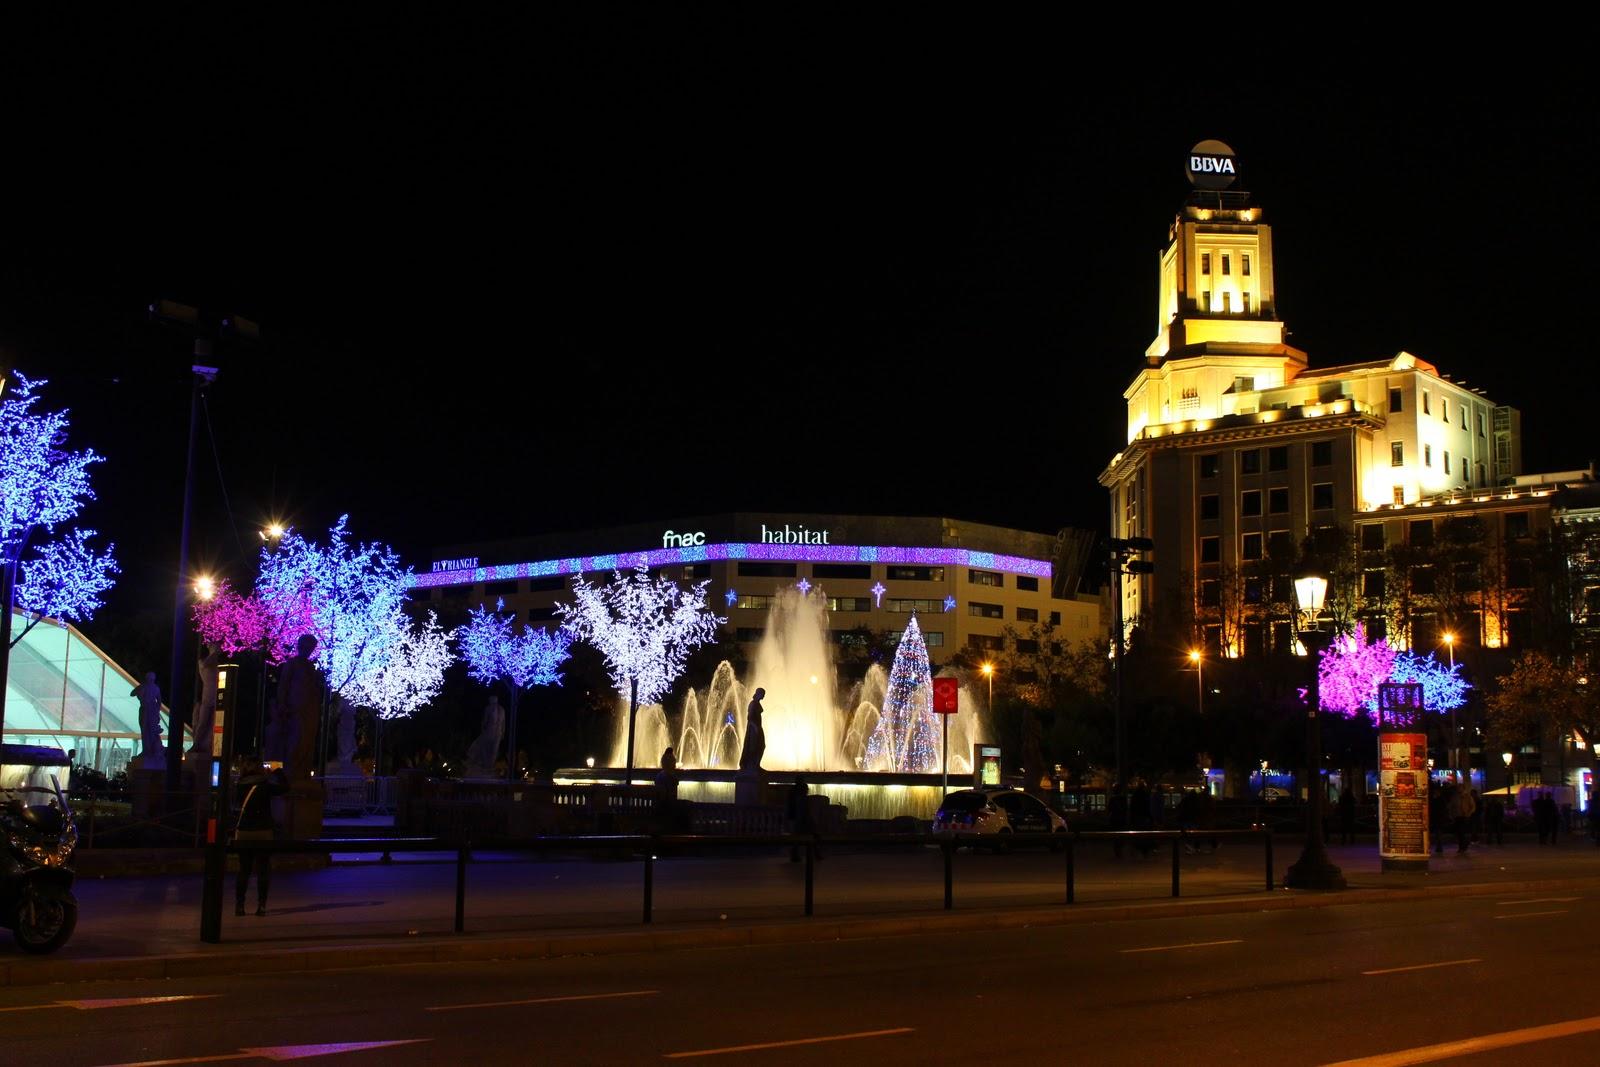 perierga.gr - Οι 15 ωραιότερες χριστουγεννιάτικες αγορές της Ευρώπης!